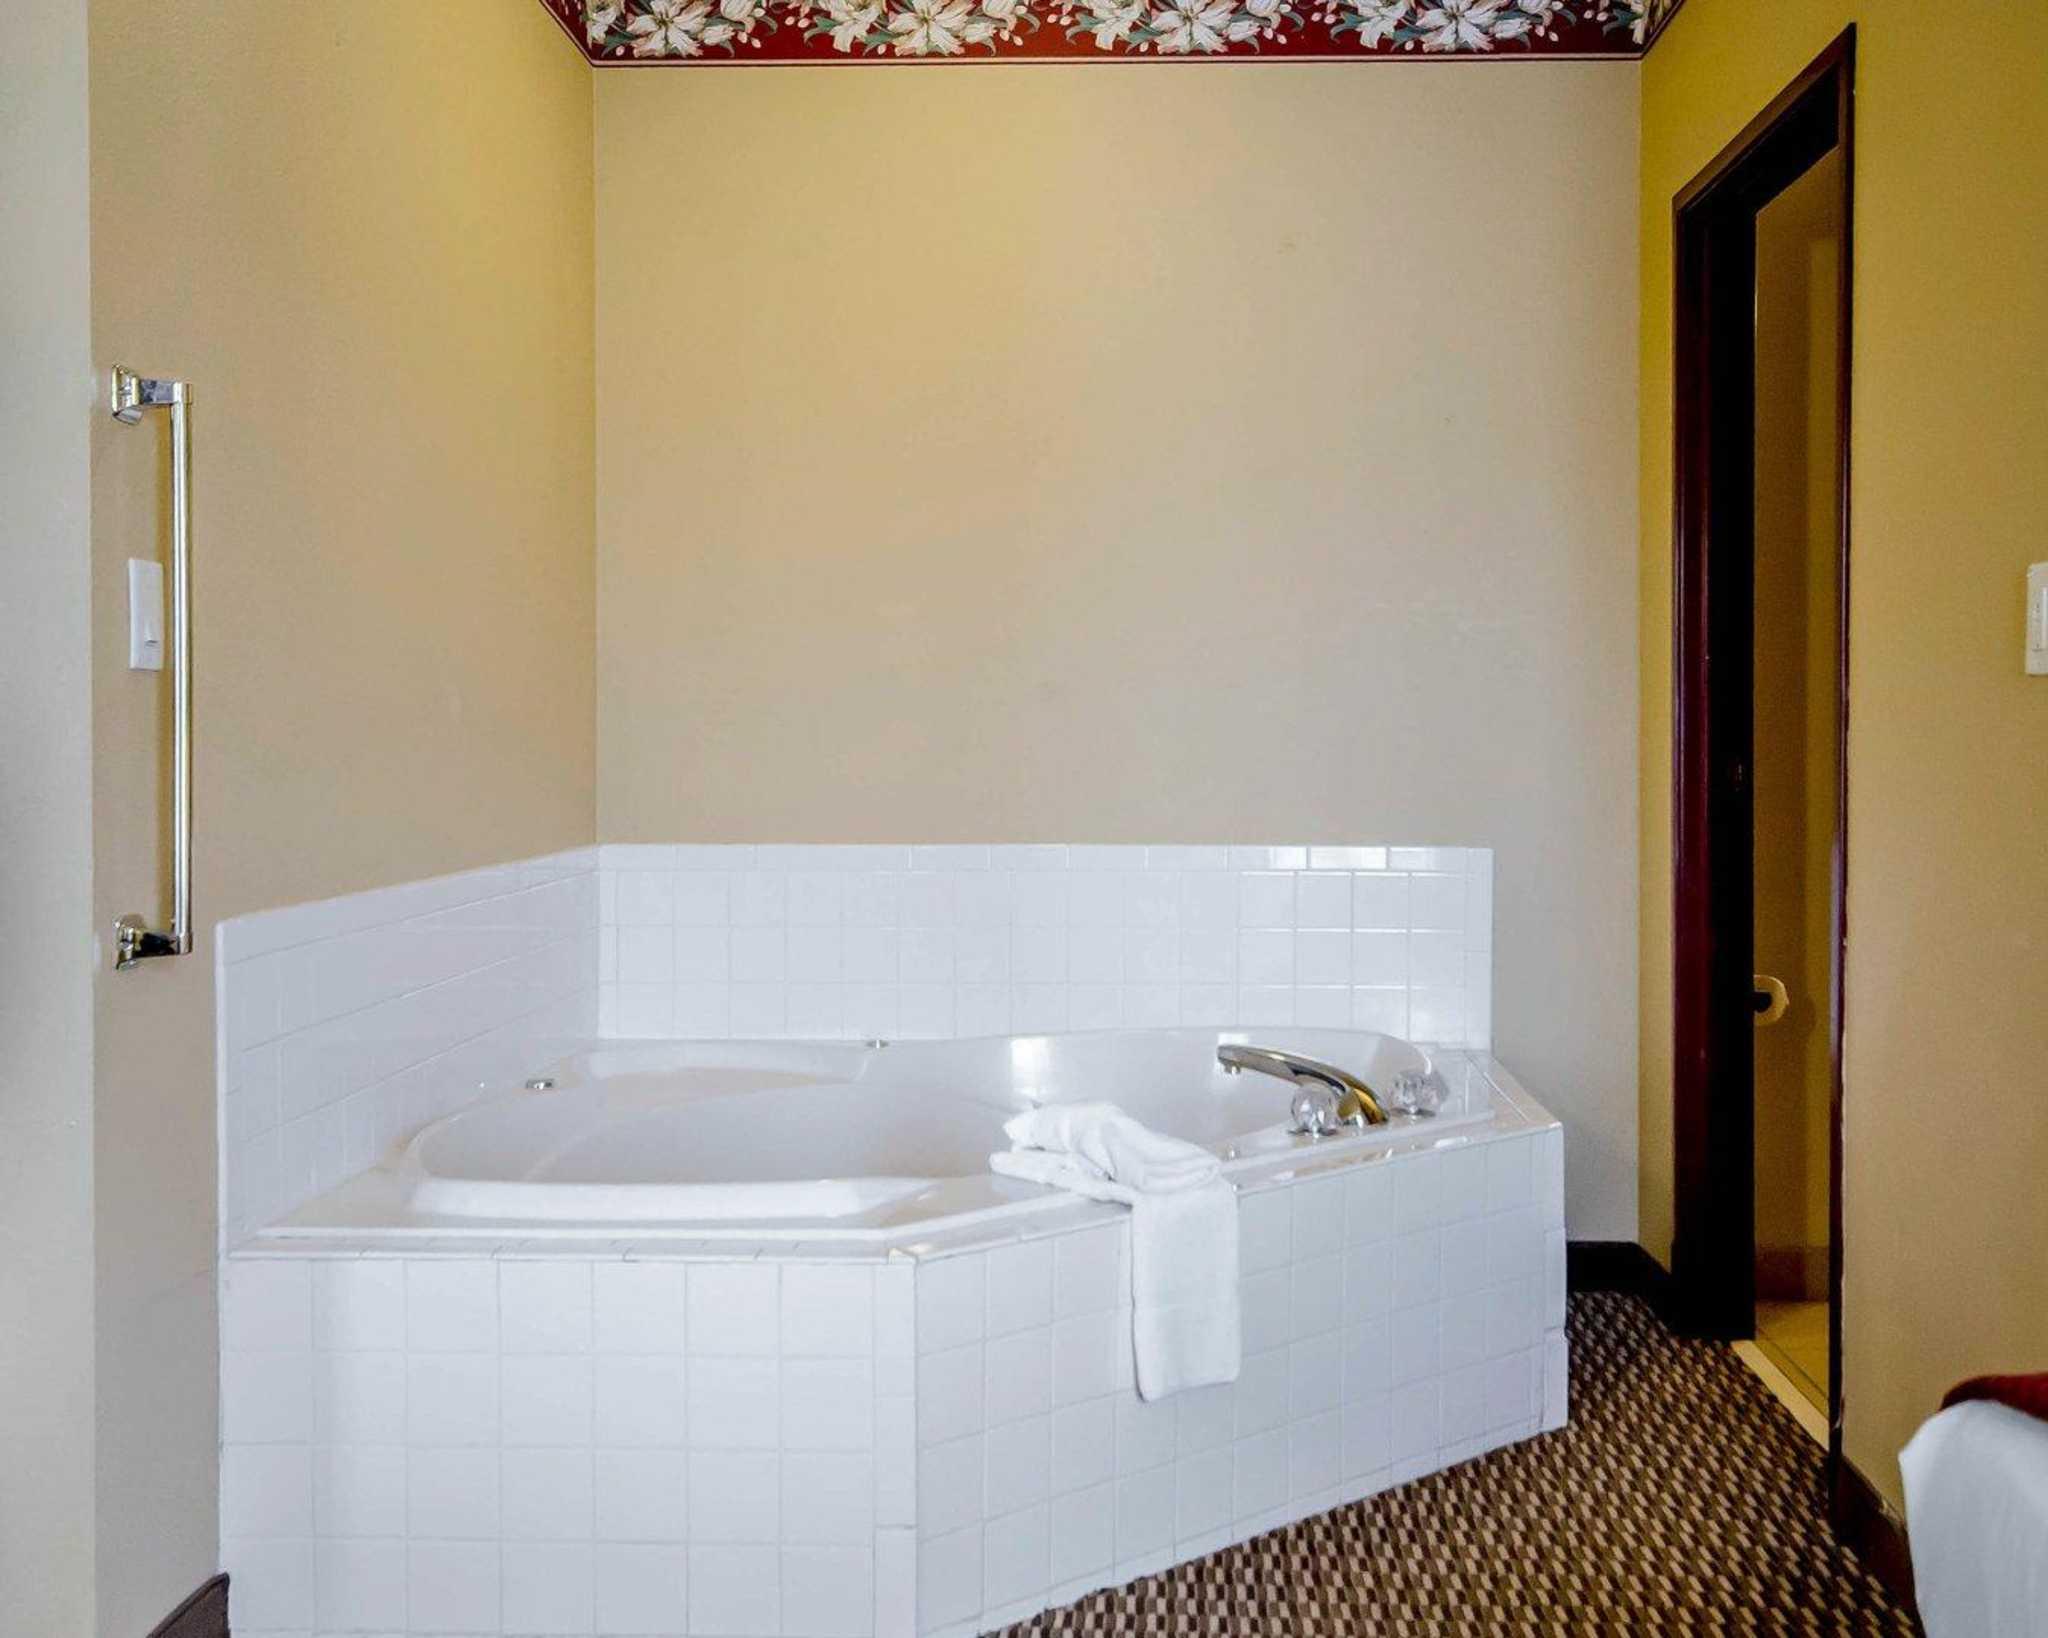 Quality Suites image 14